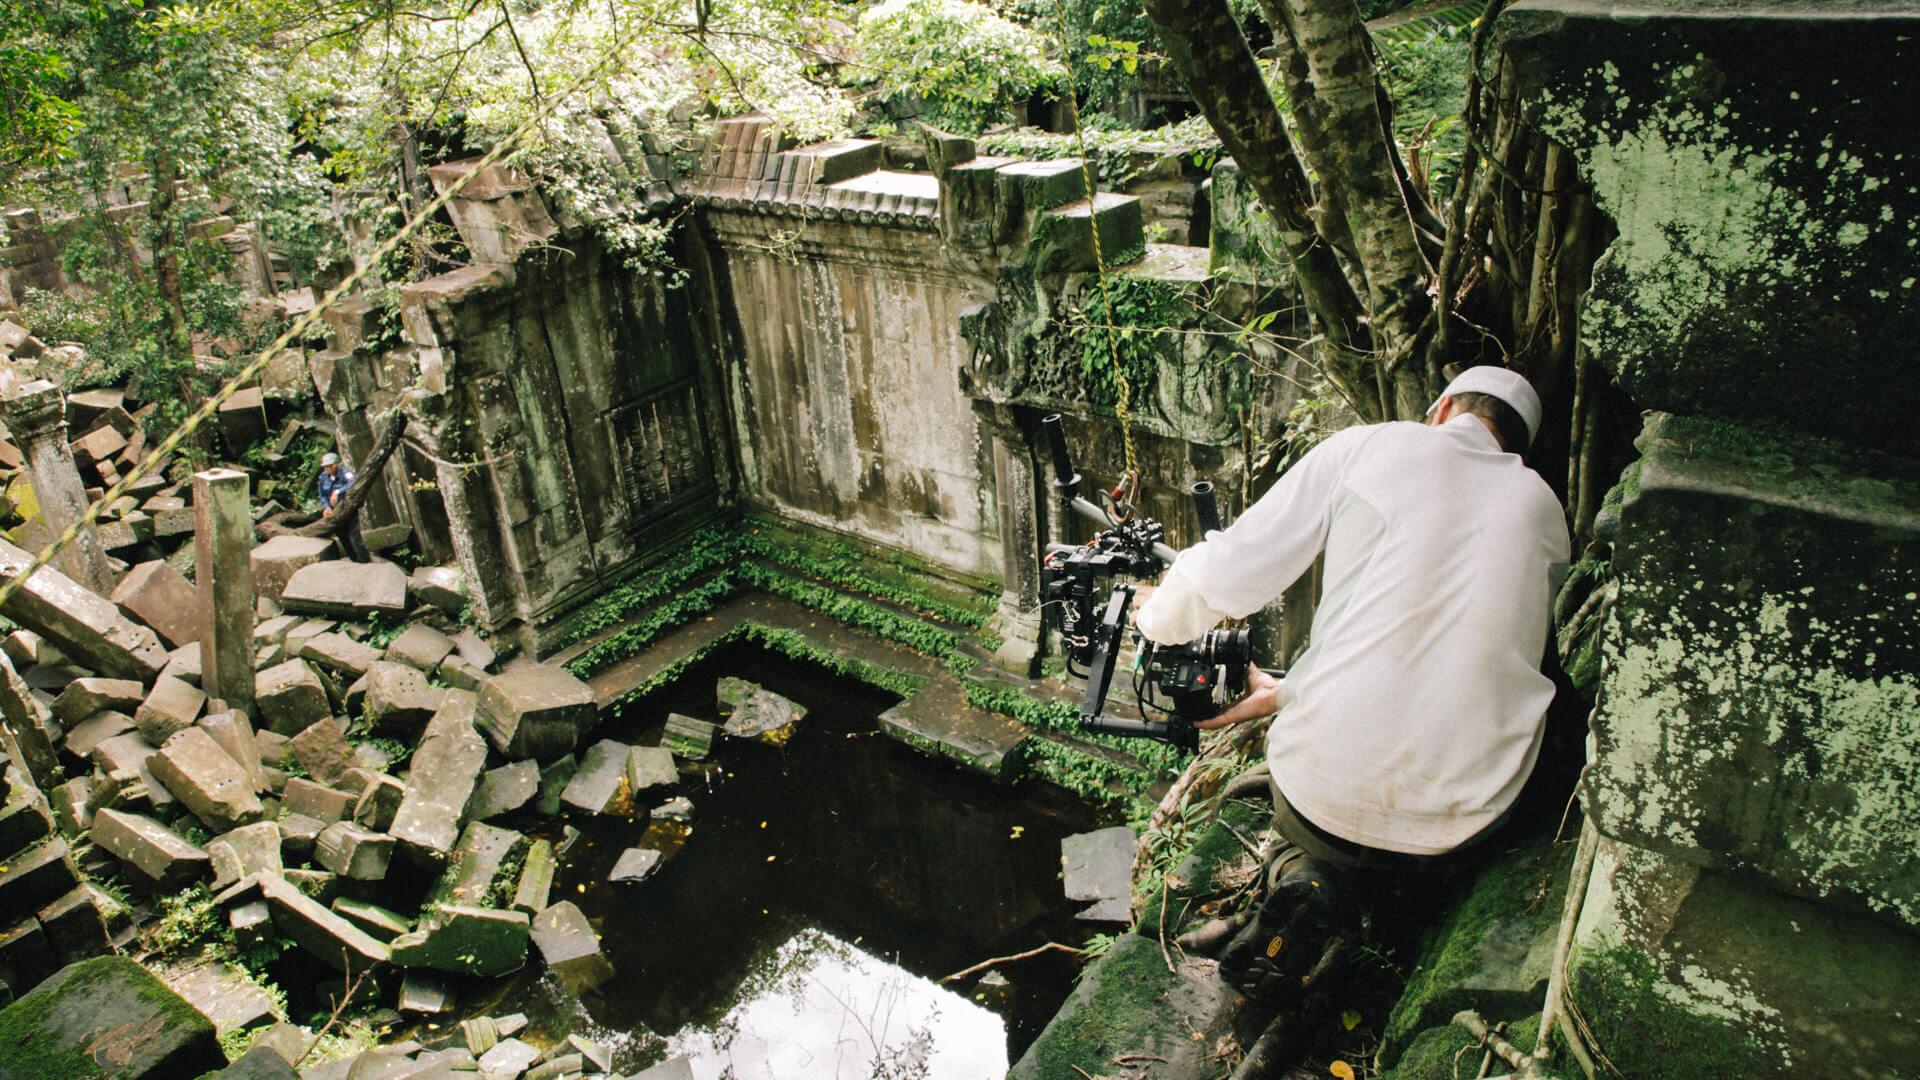 movi-operator-sam-nuttmann-cambodia-bbc-monsoon-big-rope-rig